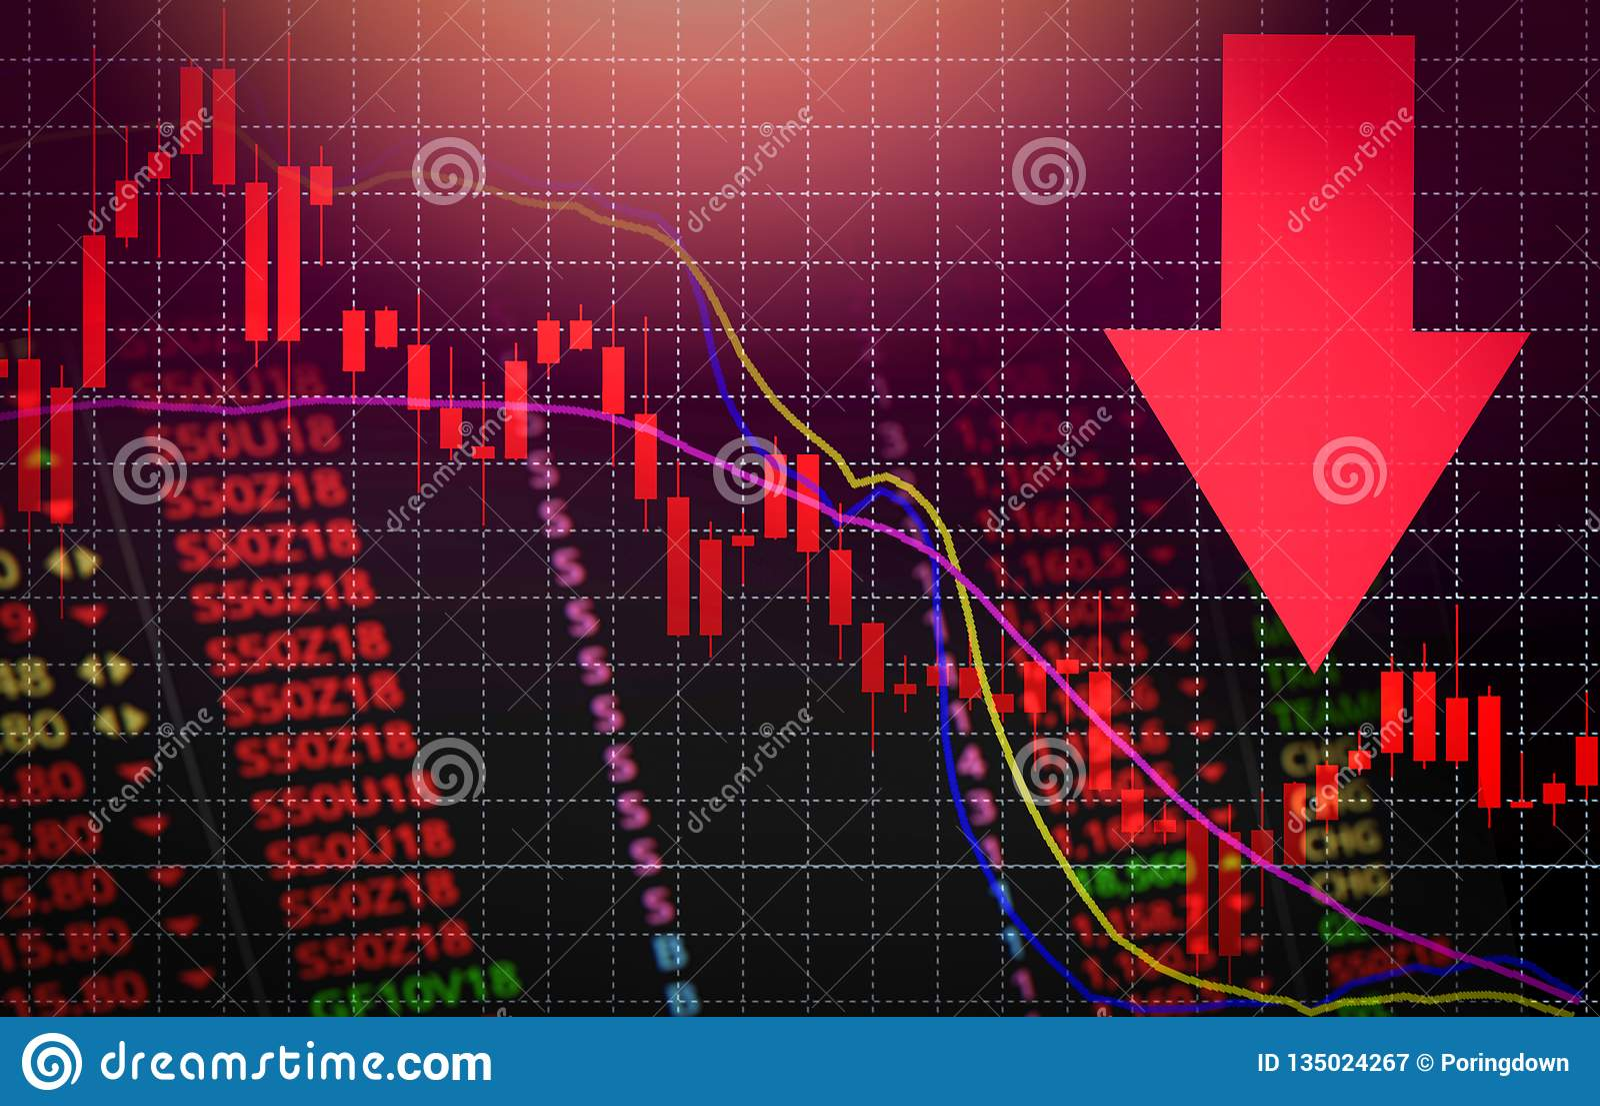 Stock Crisis Red Market Price Arrow Down Chart Fall / Stock Exchange Market Analysis Or Forex ...